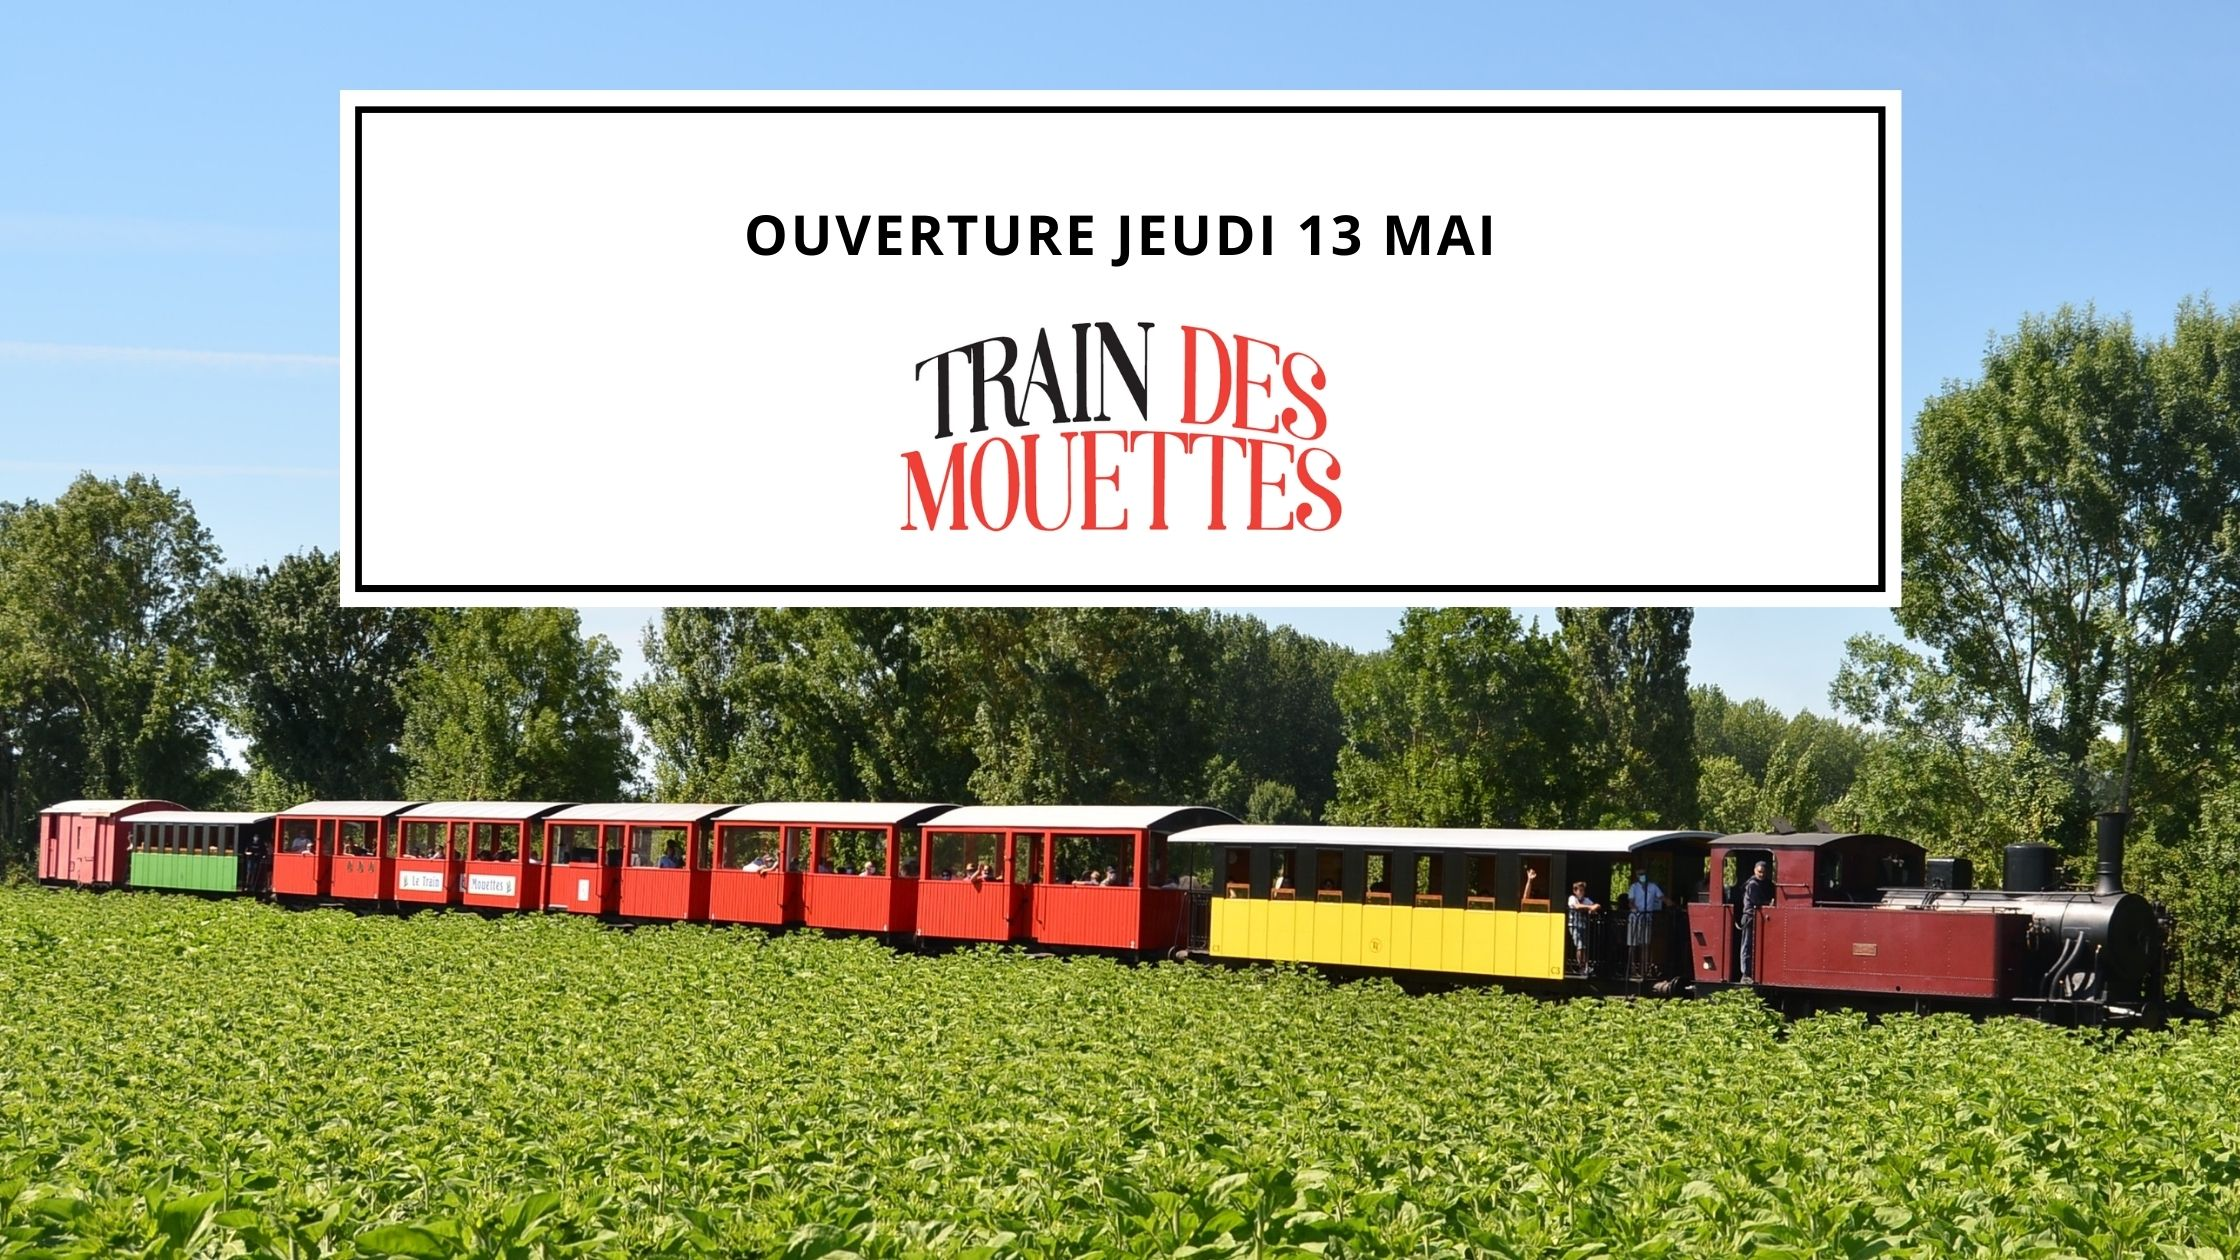 https://www.traindesmouettes.fr/wp-content/uploads/2021/05/Ouverture-bd.jpg